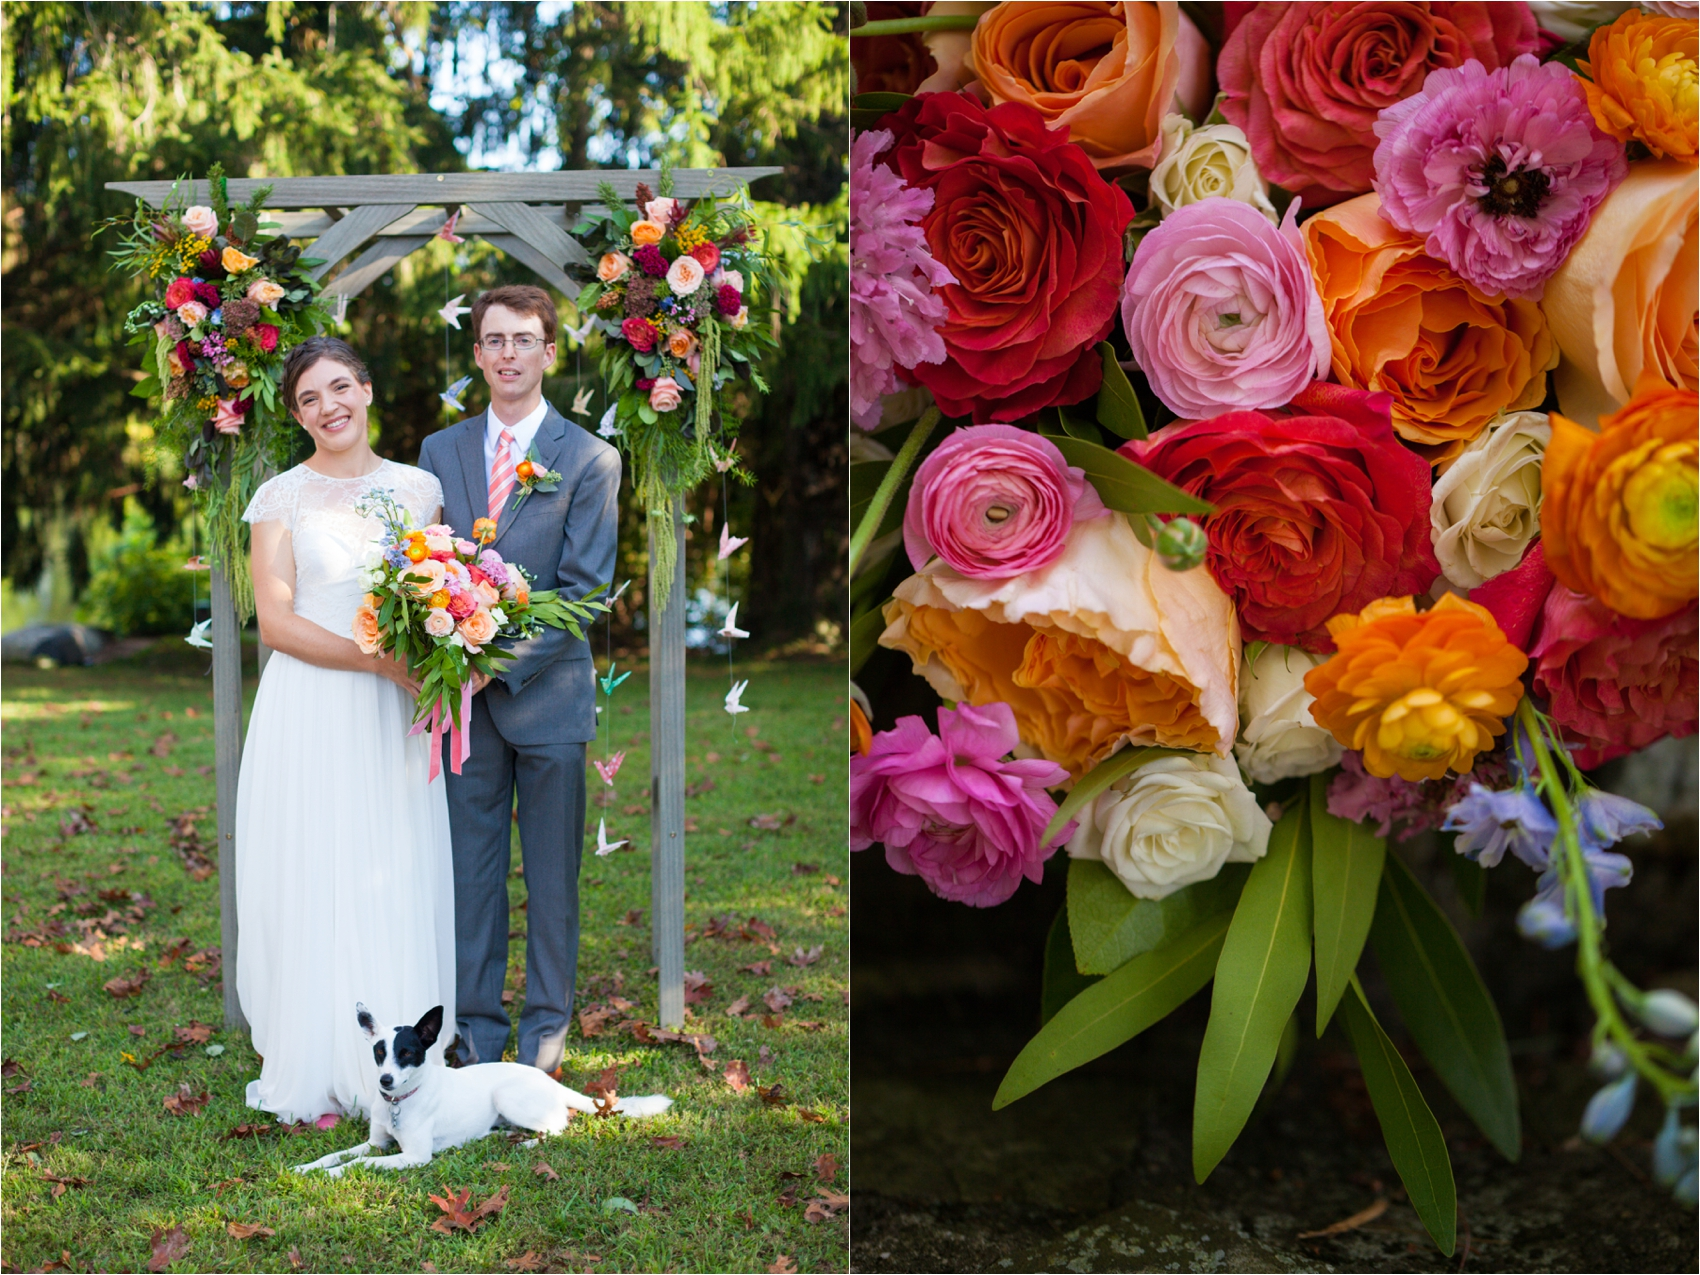 Feather-and-Oak-Rainforest-Trust-Virginia-Wedding-3758.jpg